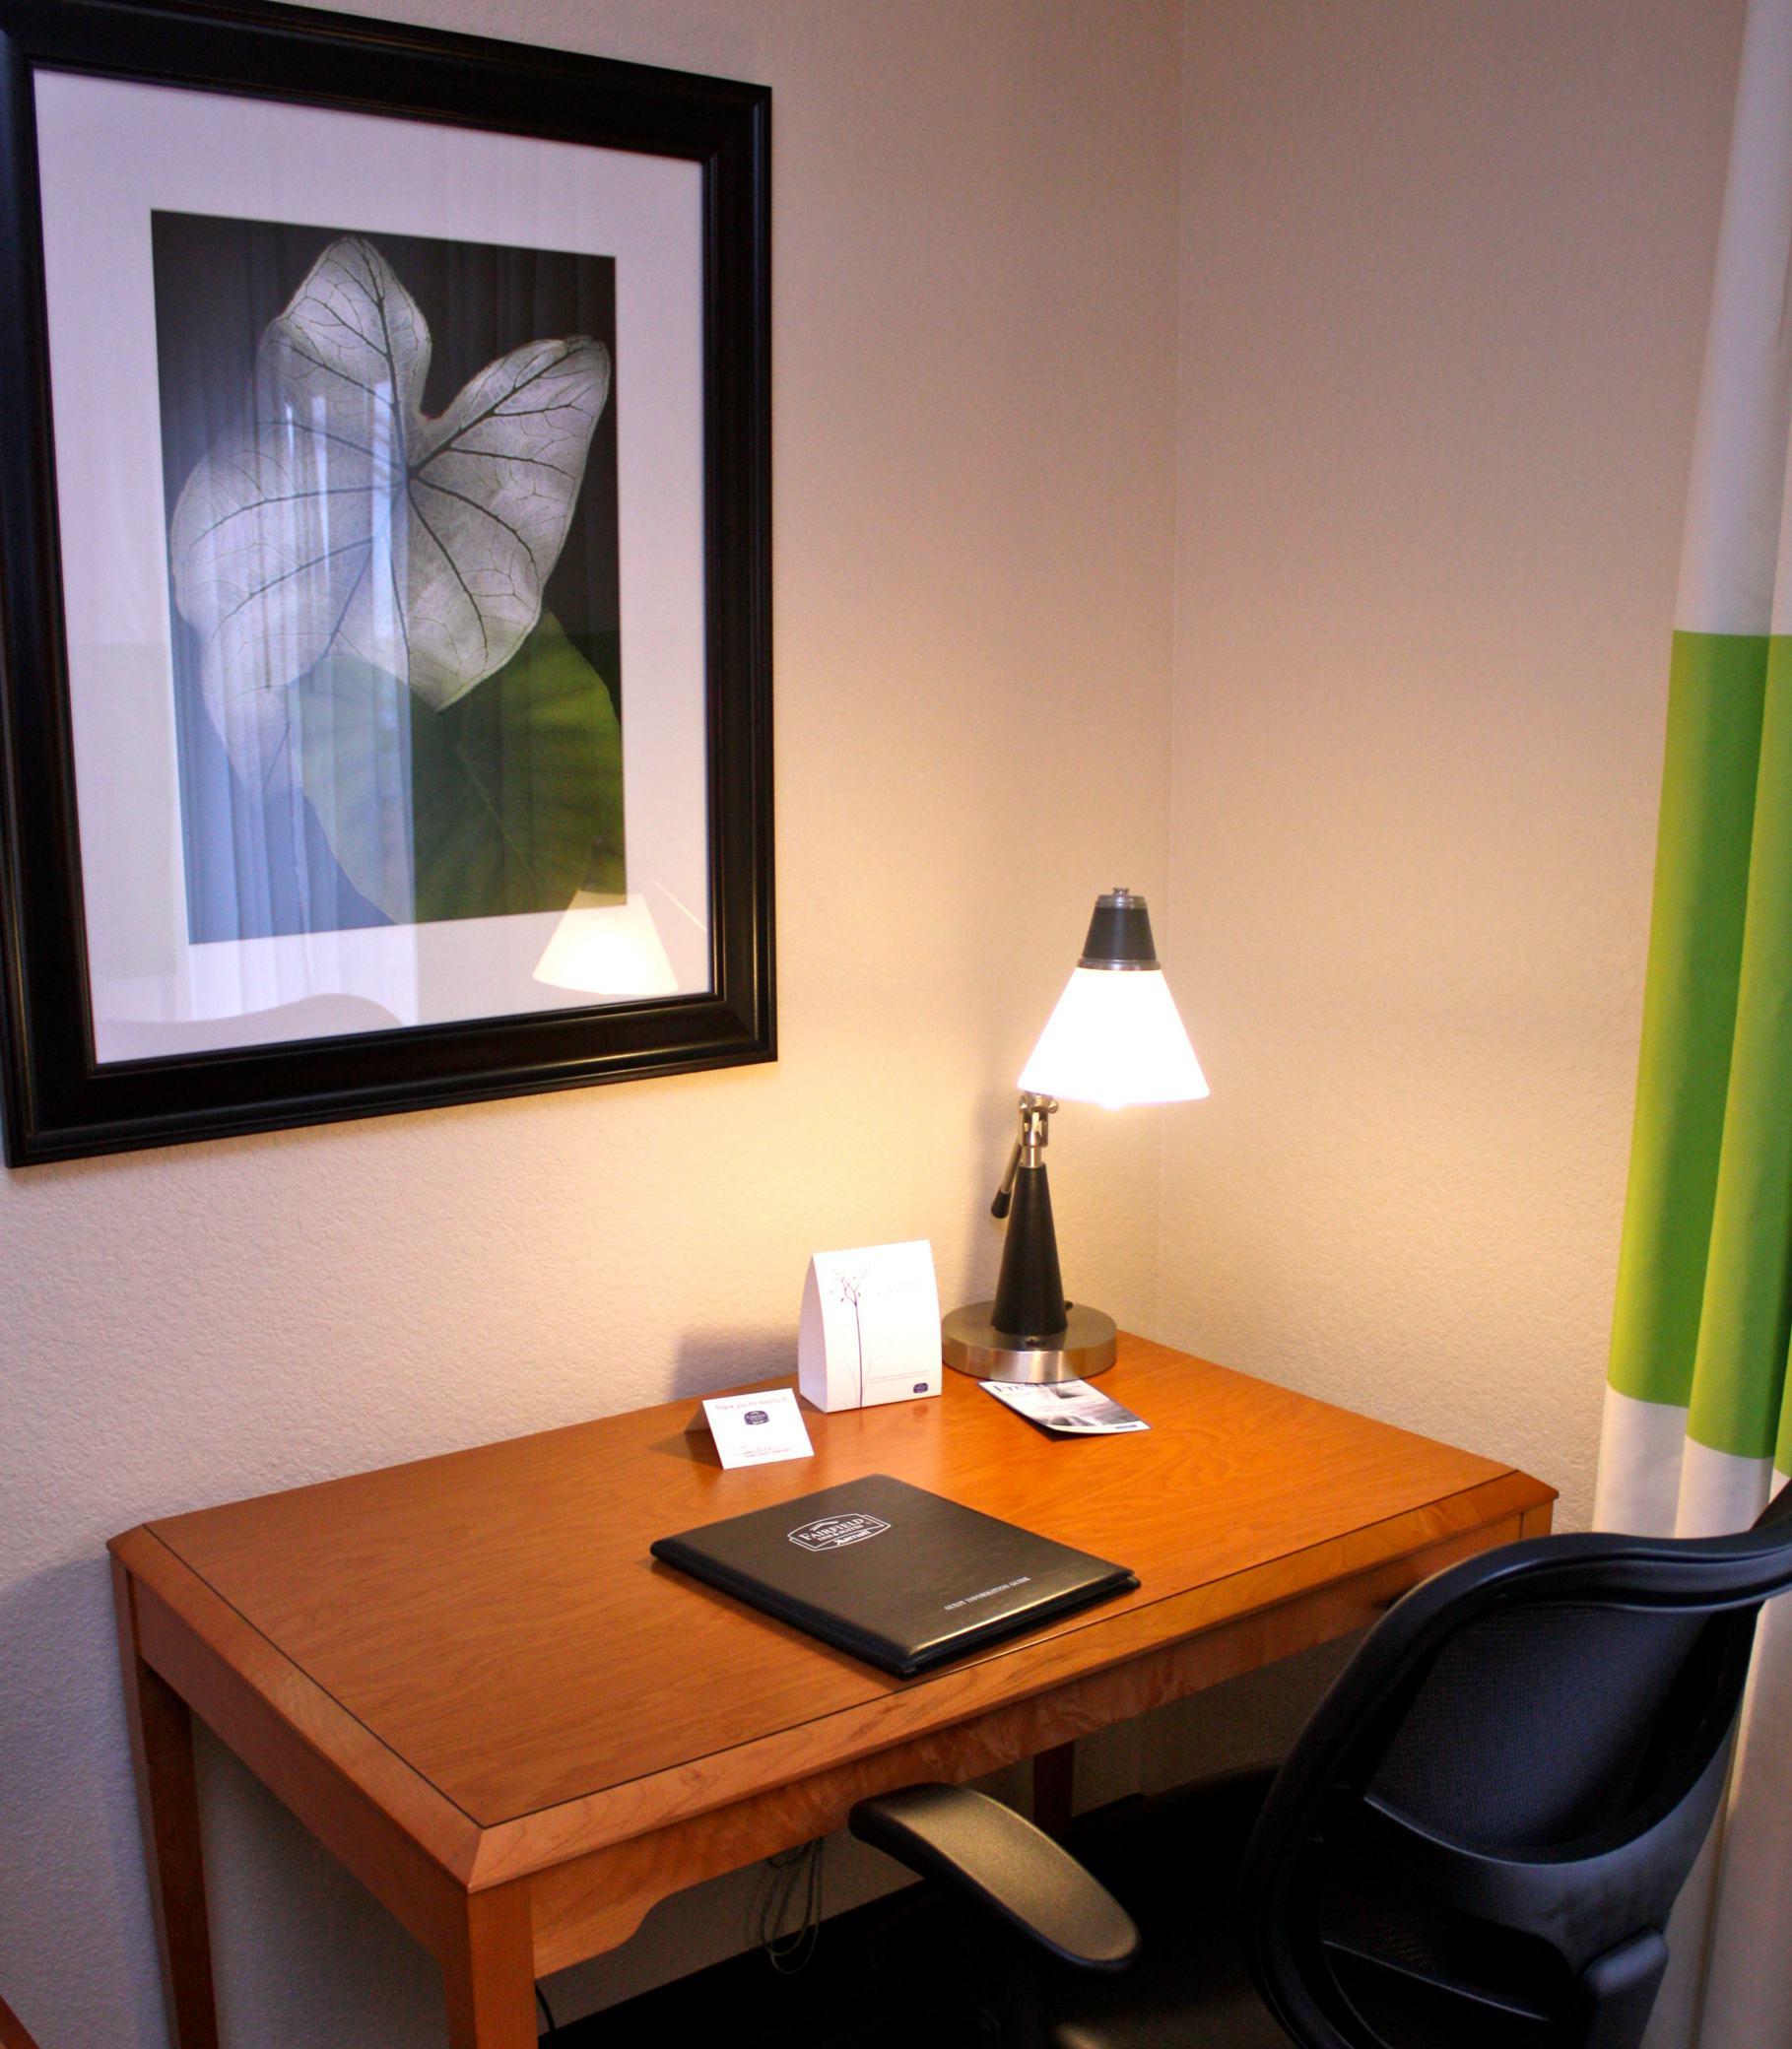 Fairfield Inn & Suites by Marriott Bentonville Rogers image 9